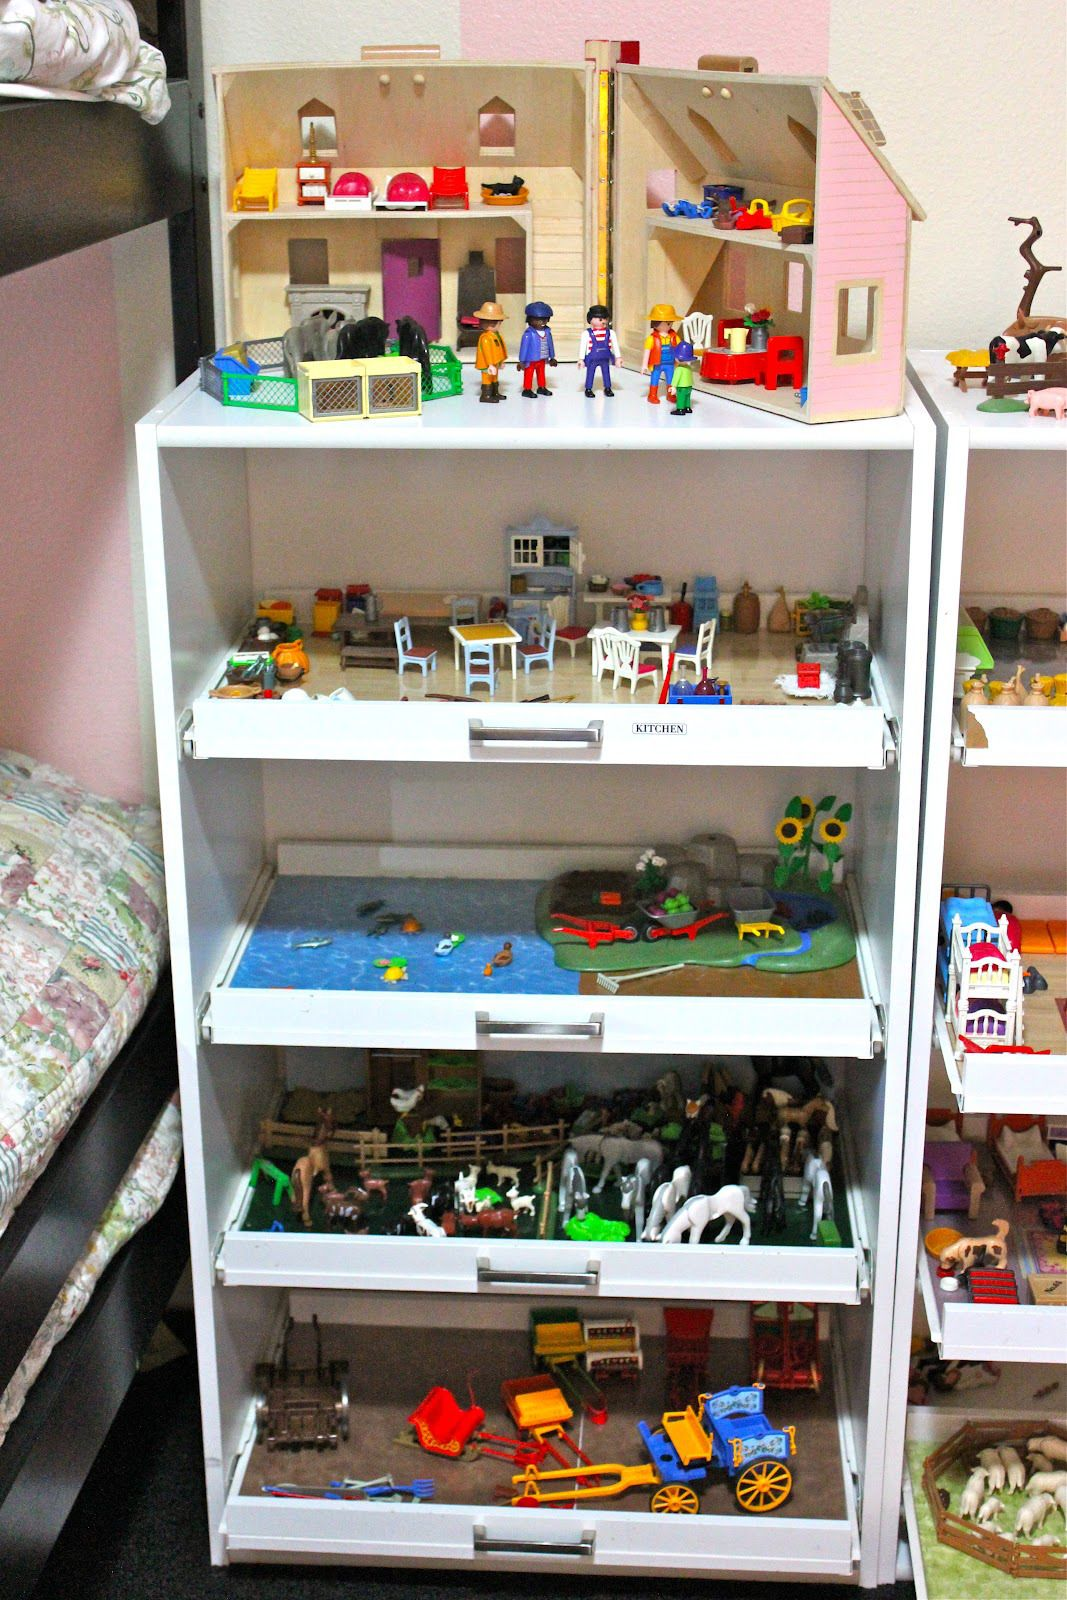 Playmobil display playmobil pinterest kinderzimmer for Kinderschlafzimmer ideen